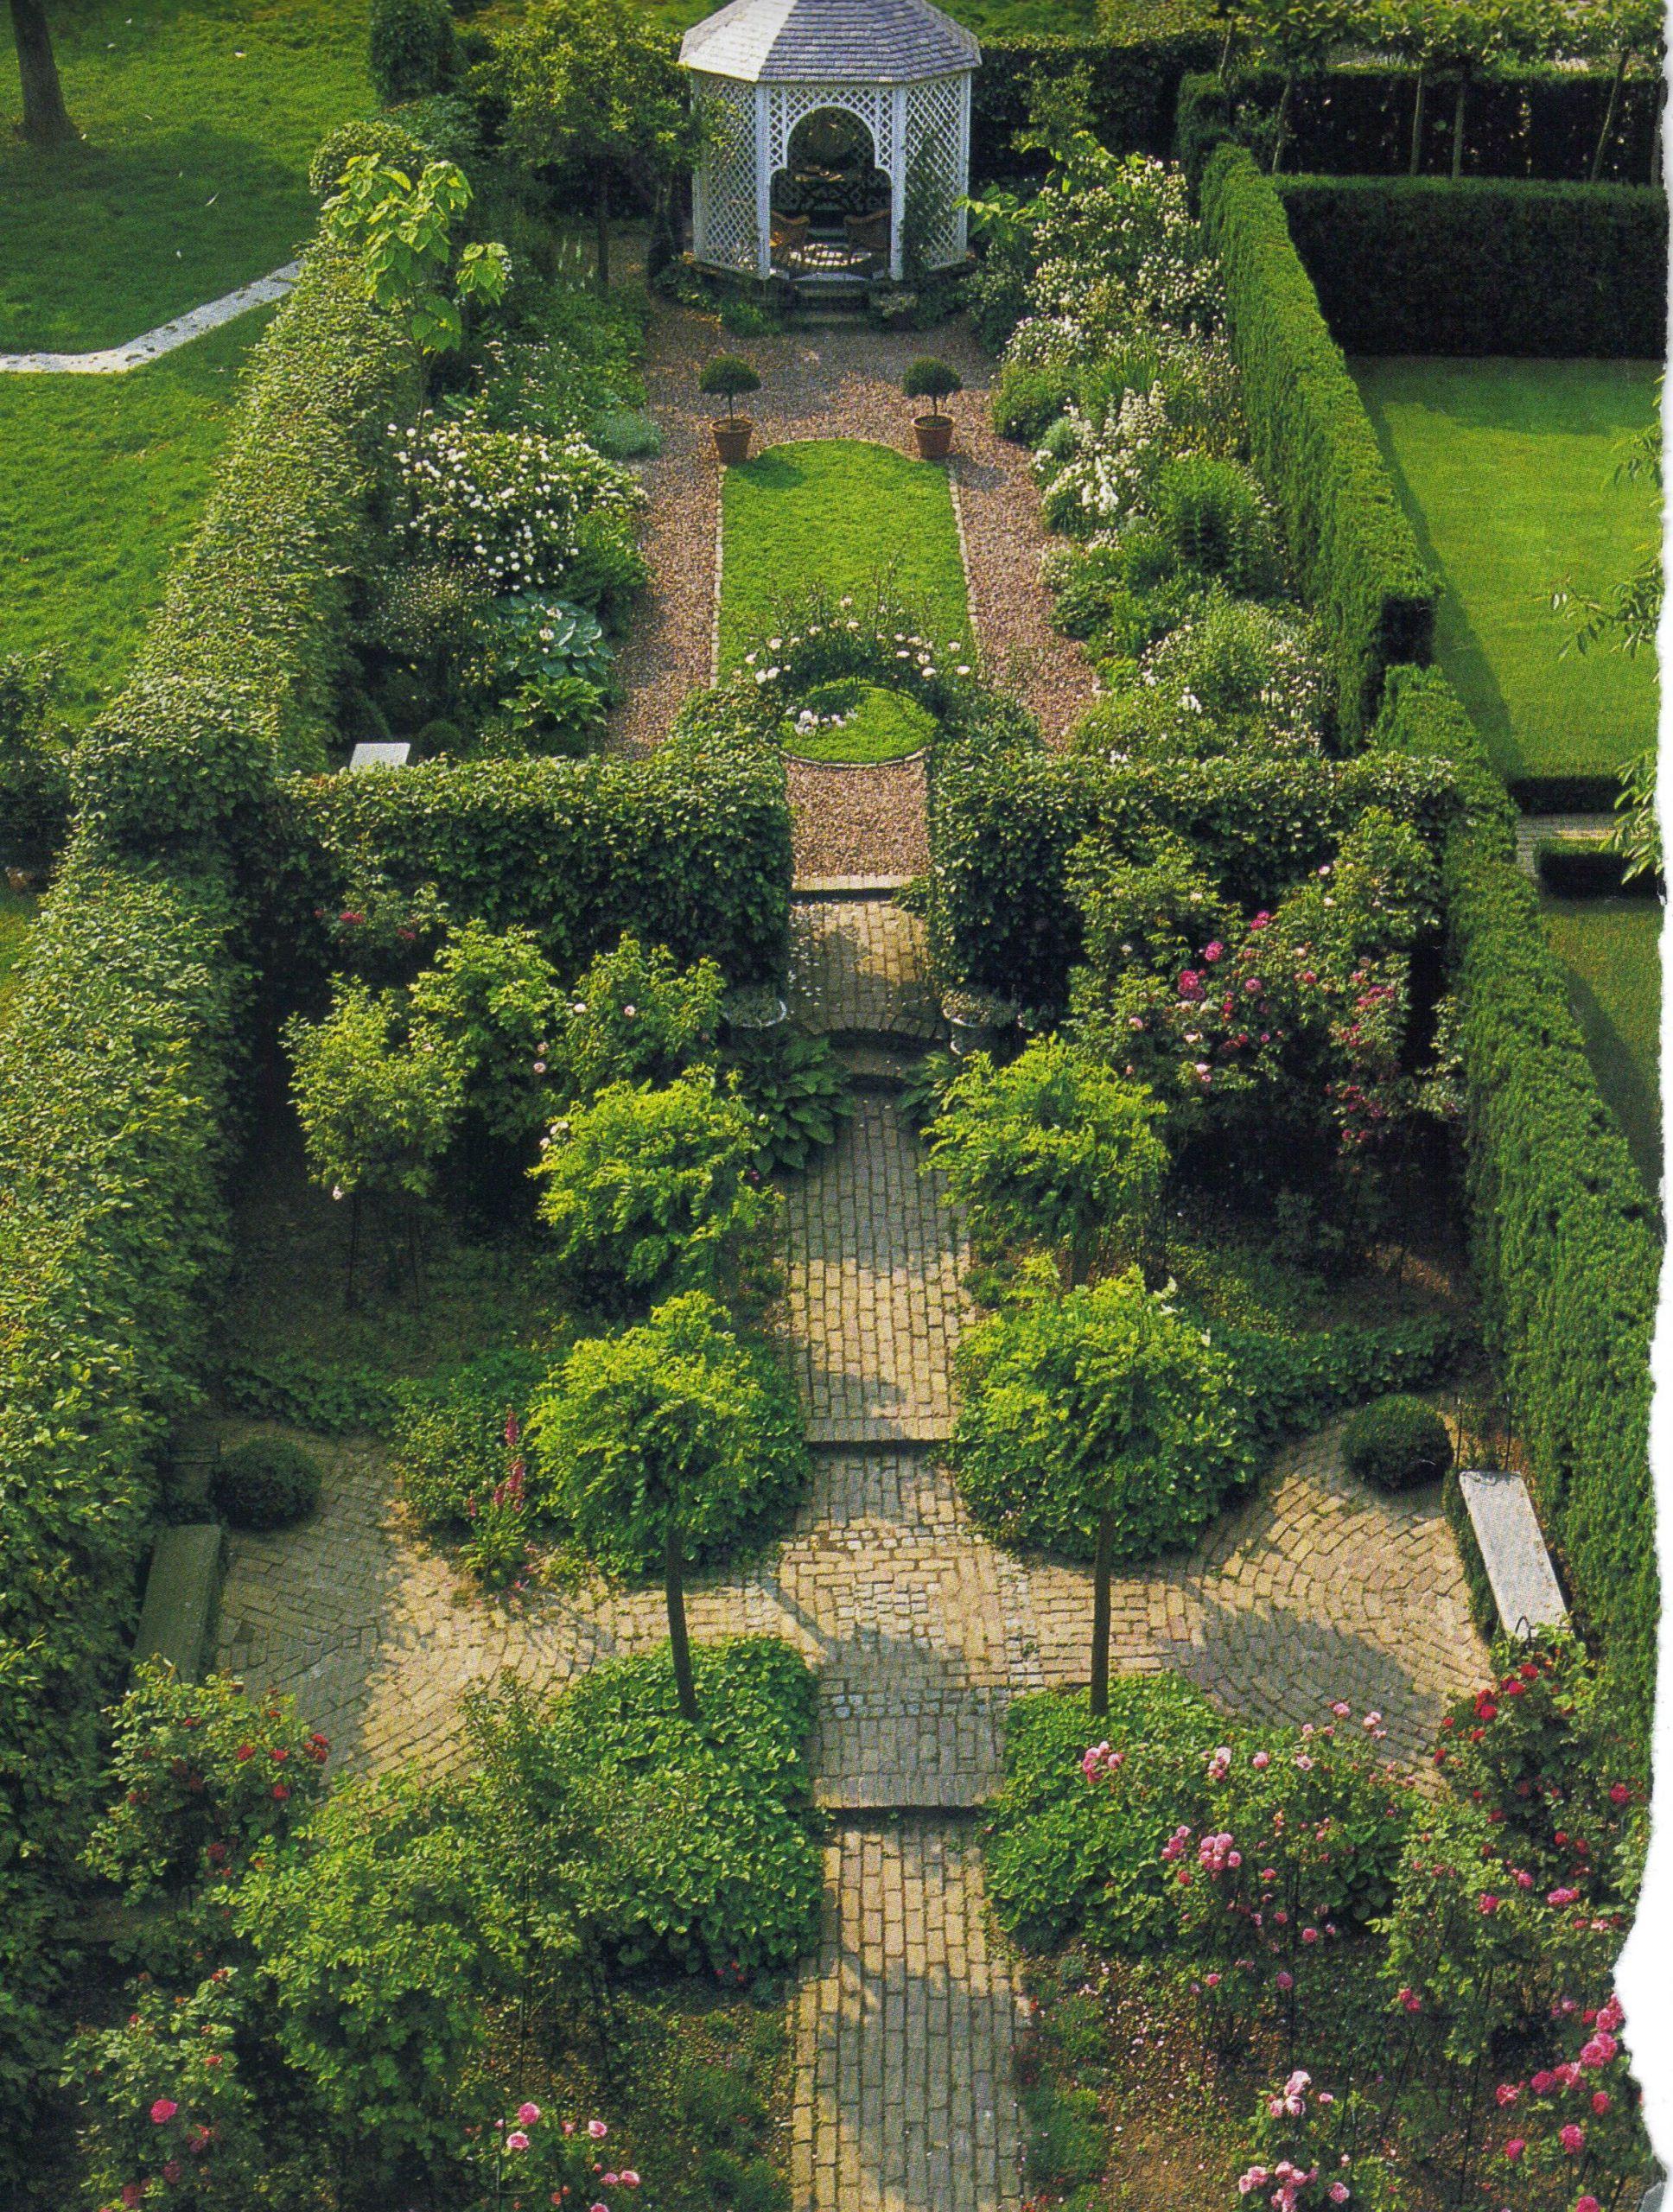 Garten Versailles Frisch 283 Best Gartenkunst Images